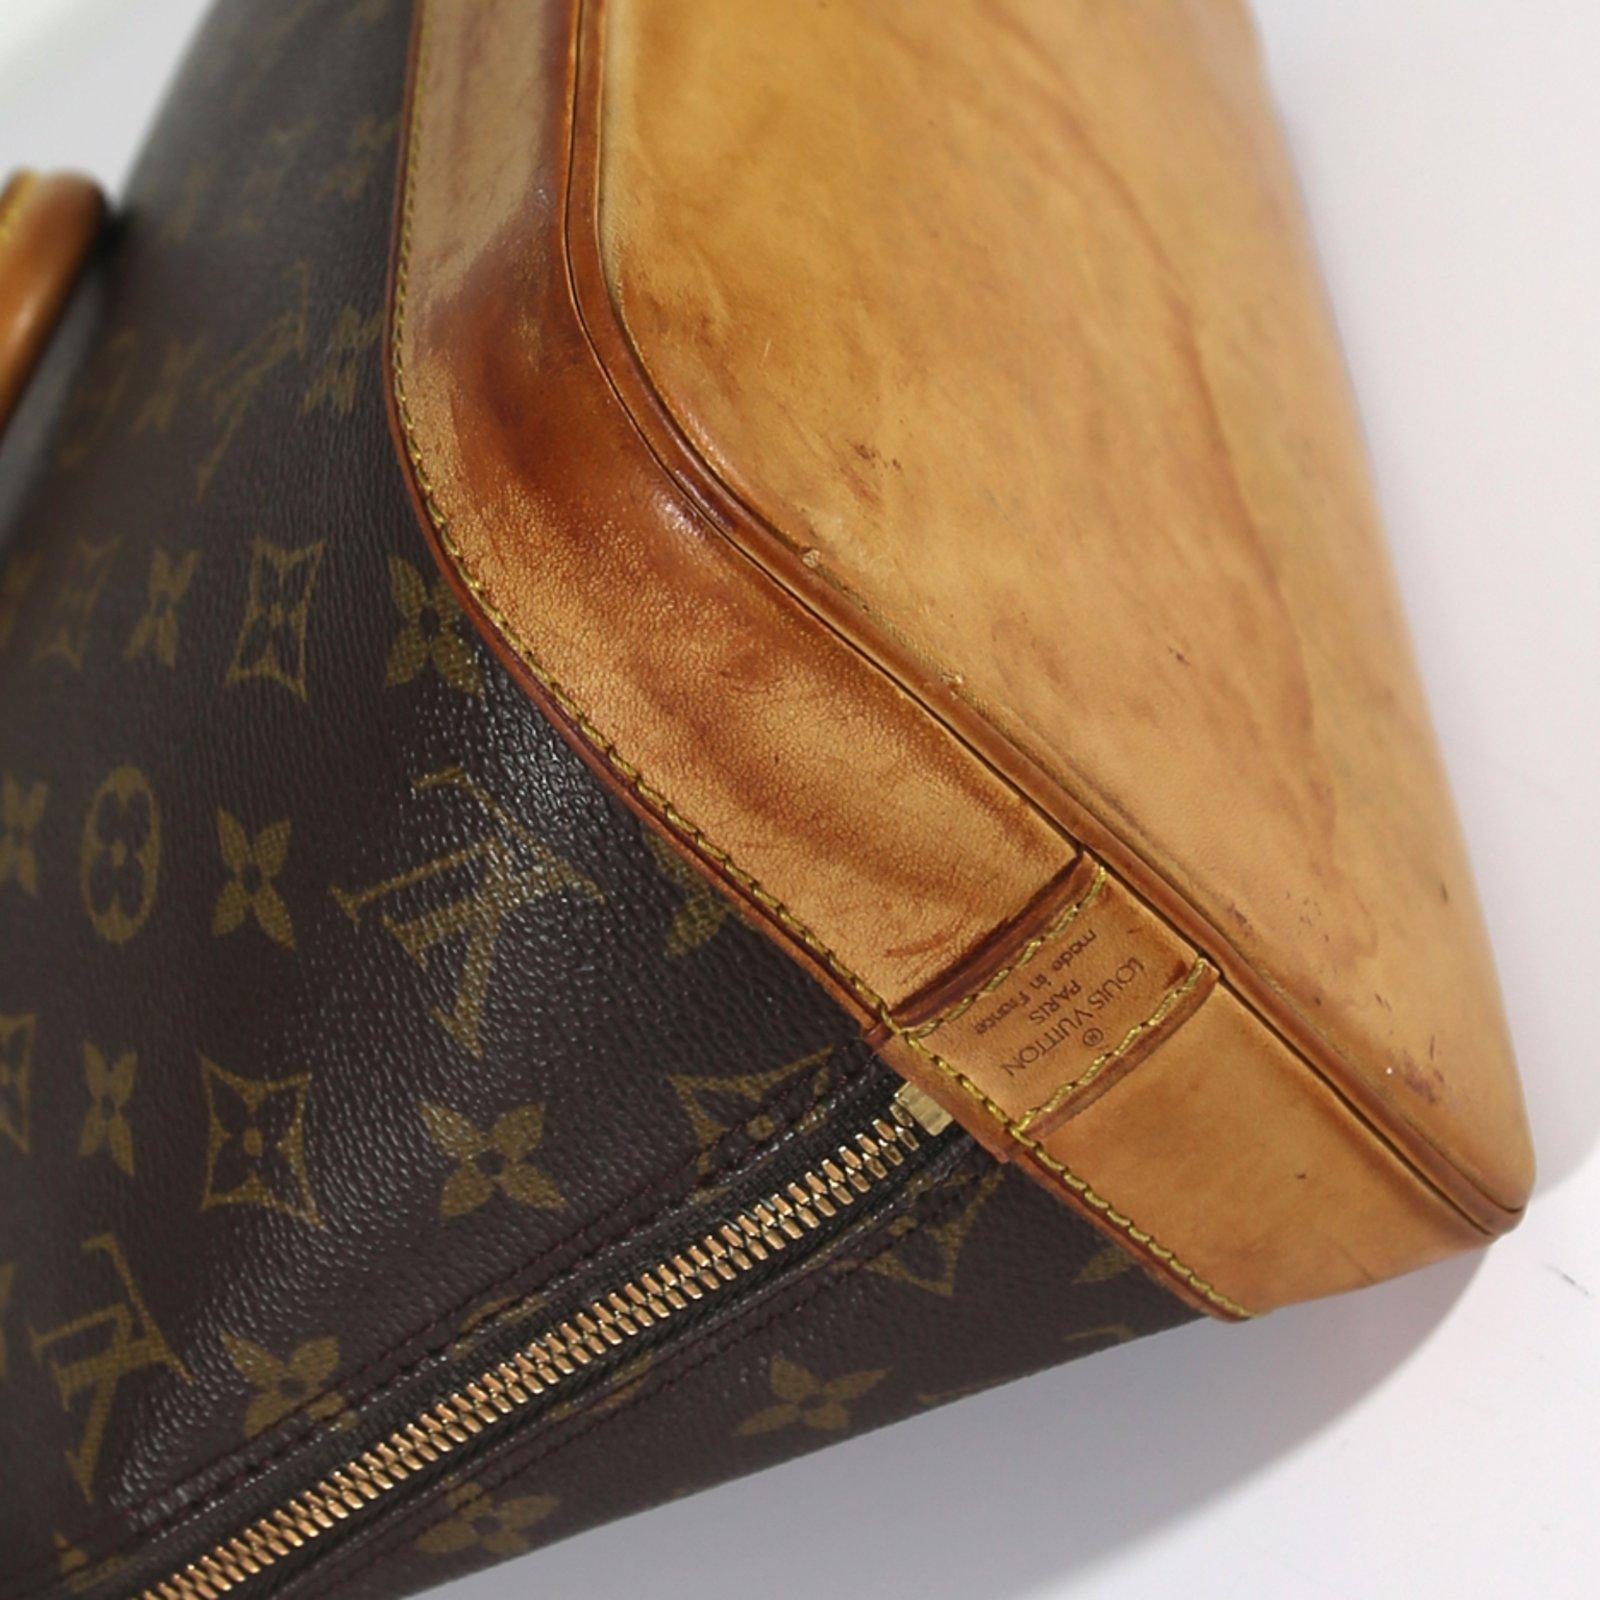 363e7c53b8 Sacs à main Louis Vuitton Alma PM Toile Marron ref.6831 - Joli Closet